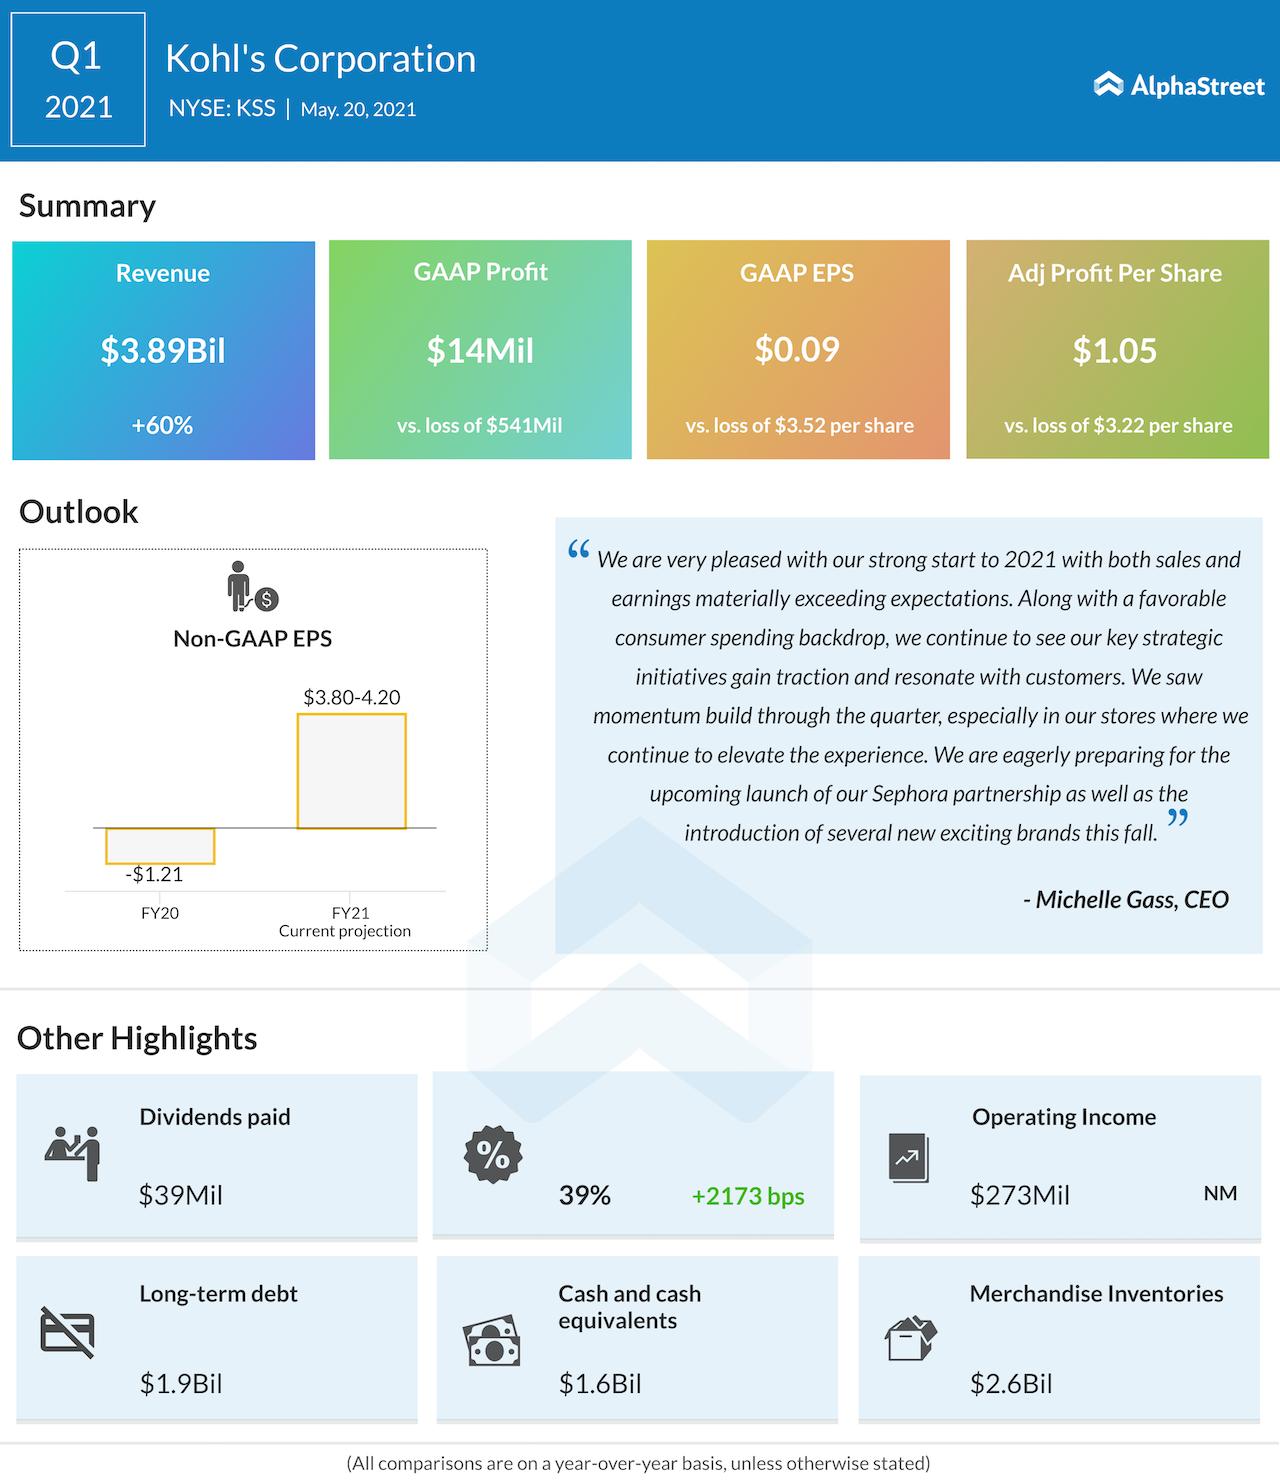 Kohl's Corp Q1 2021 earnings